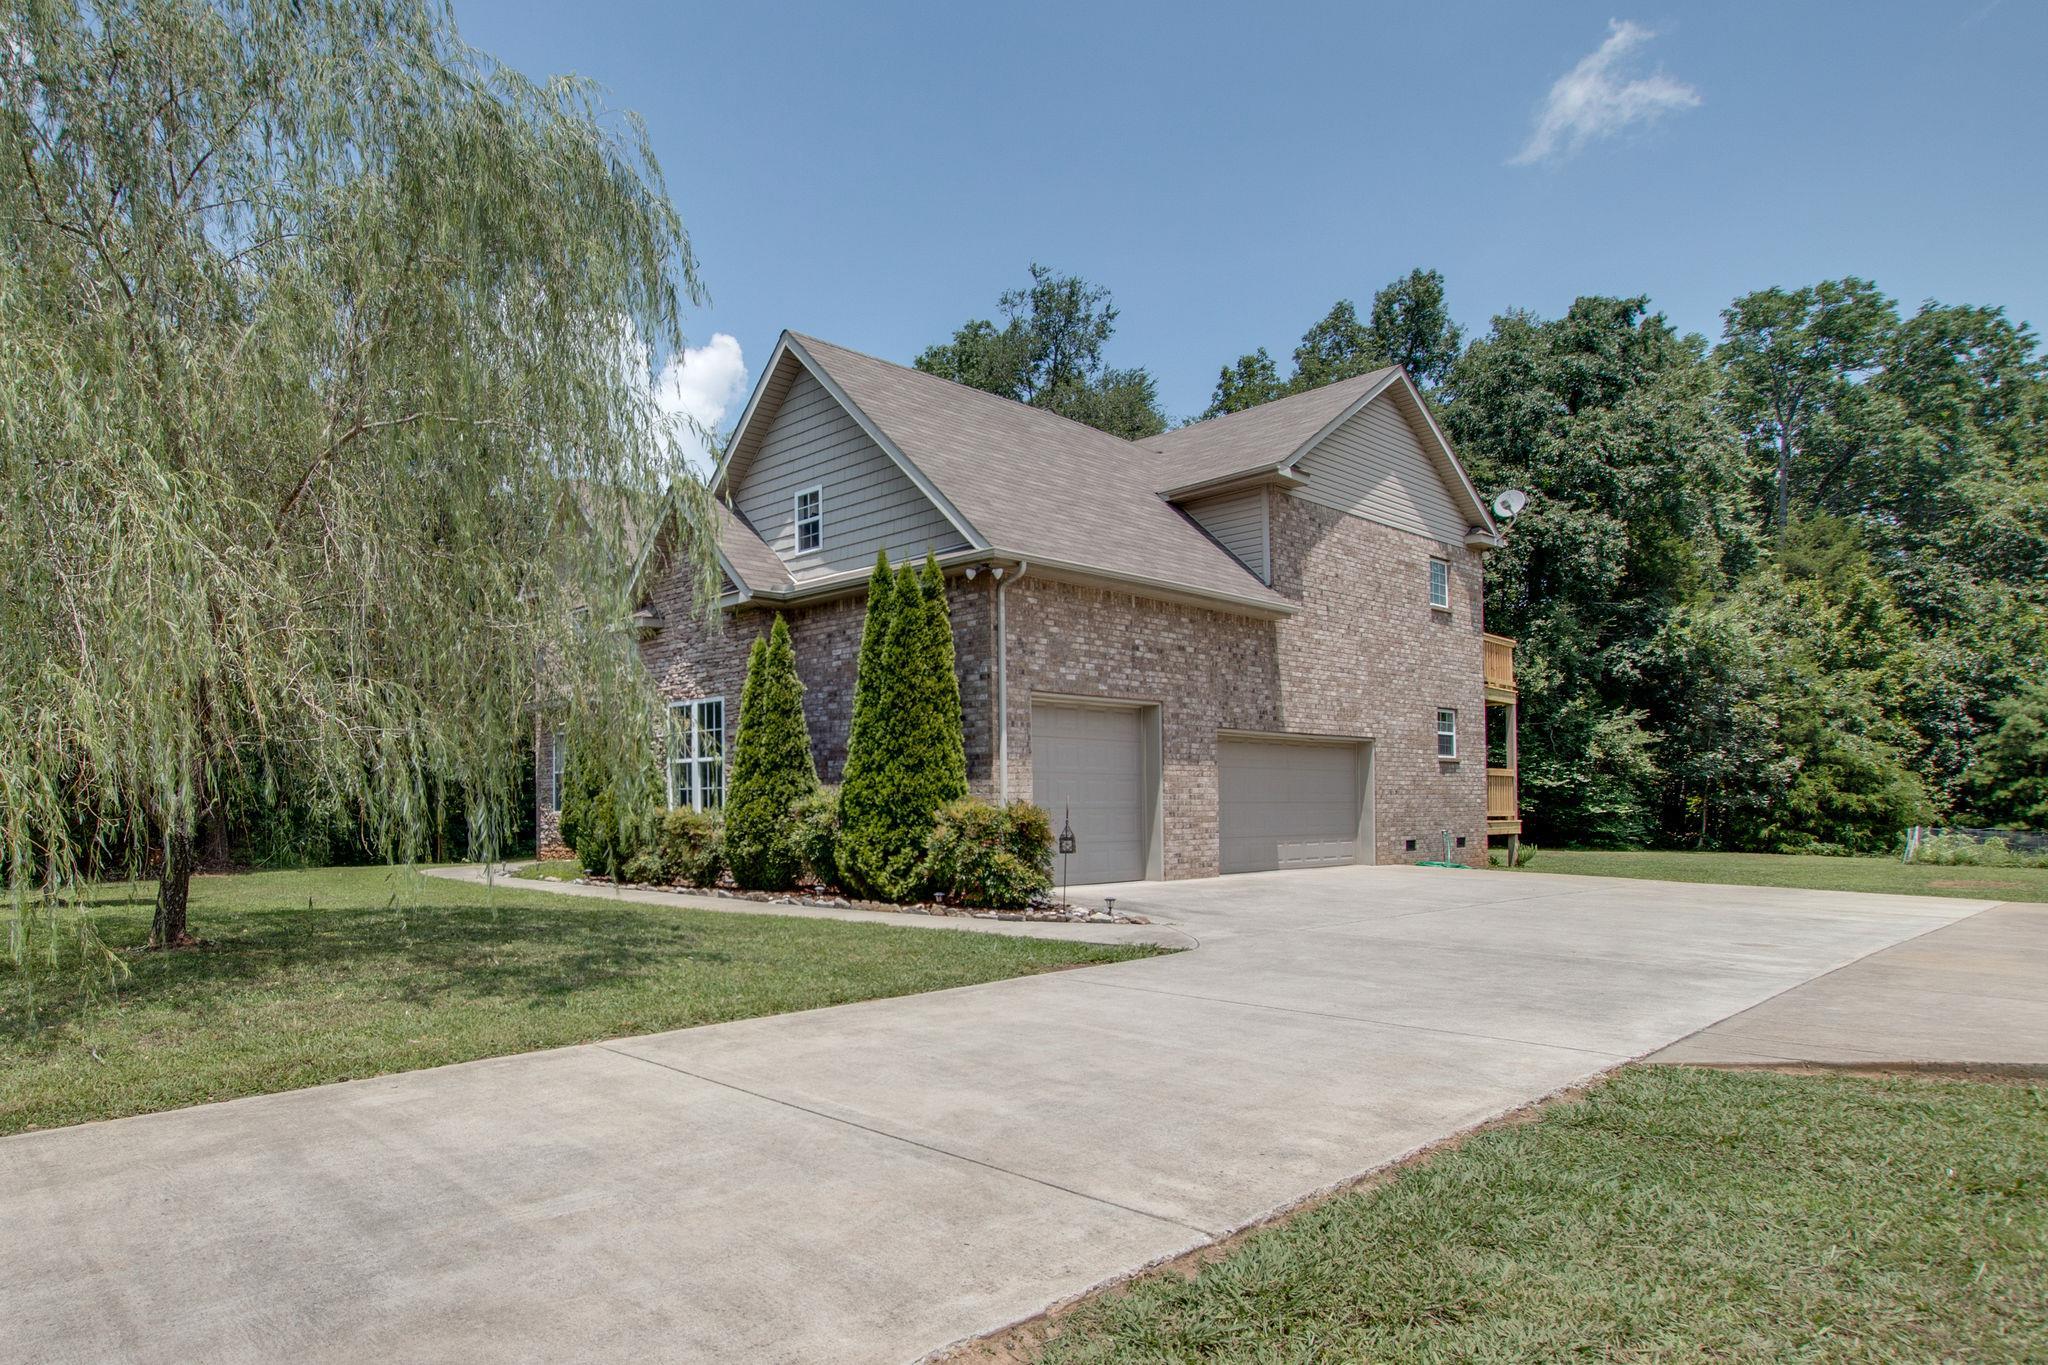 2009 Creekstone Xing, Christiana, TN 37037 - Christiana, TN real estate listing